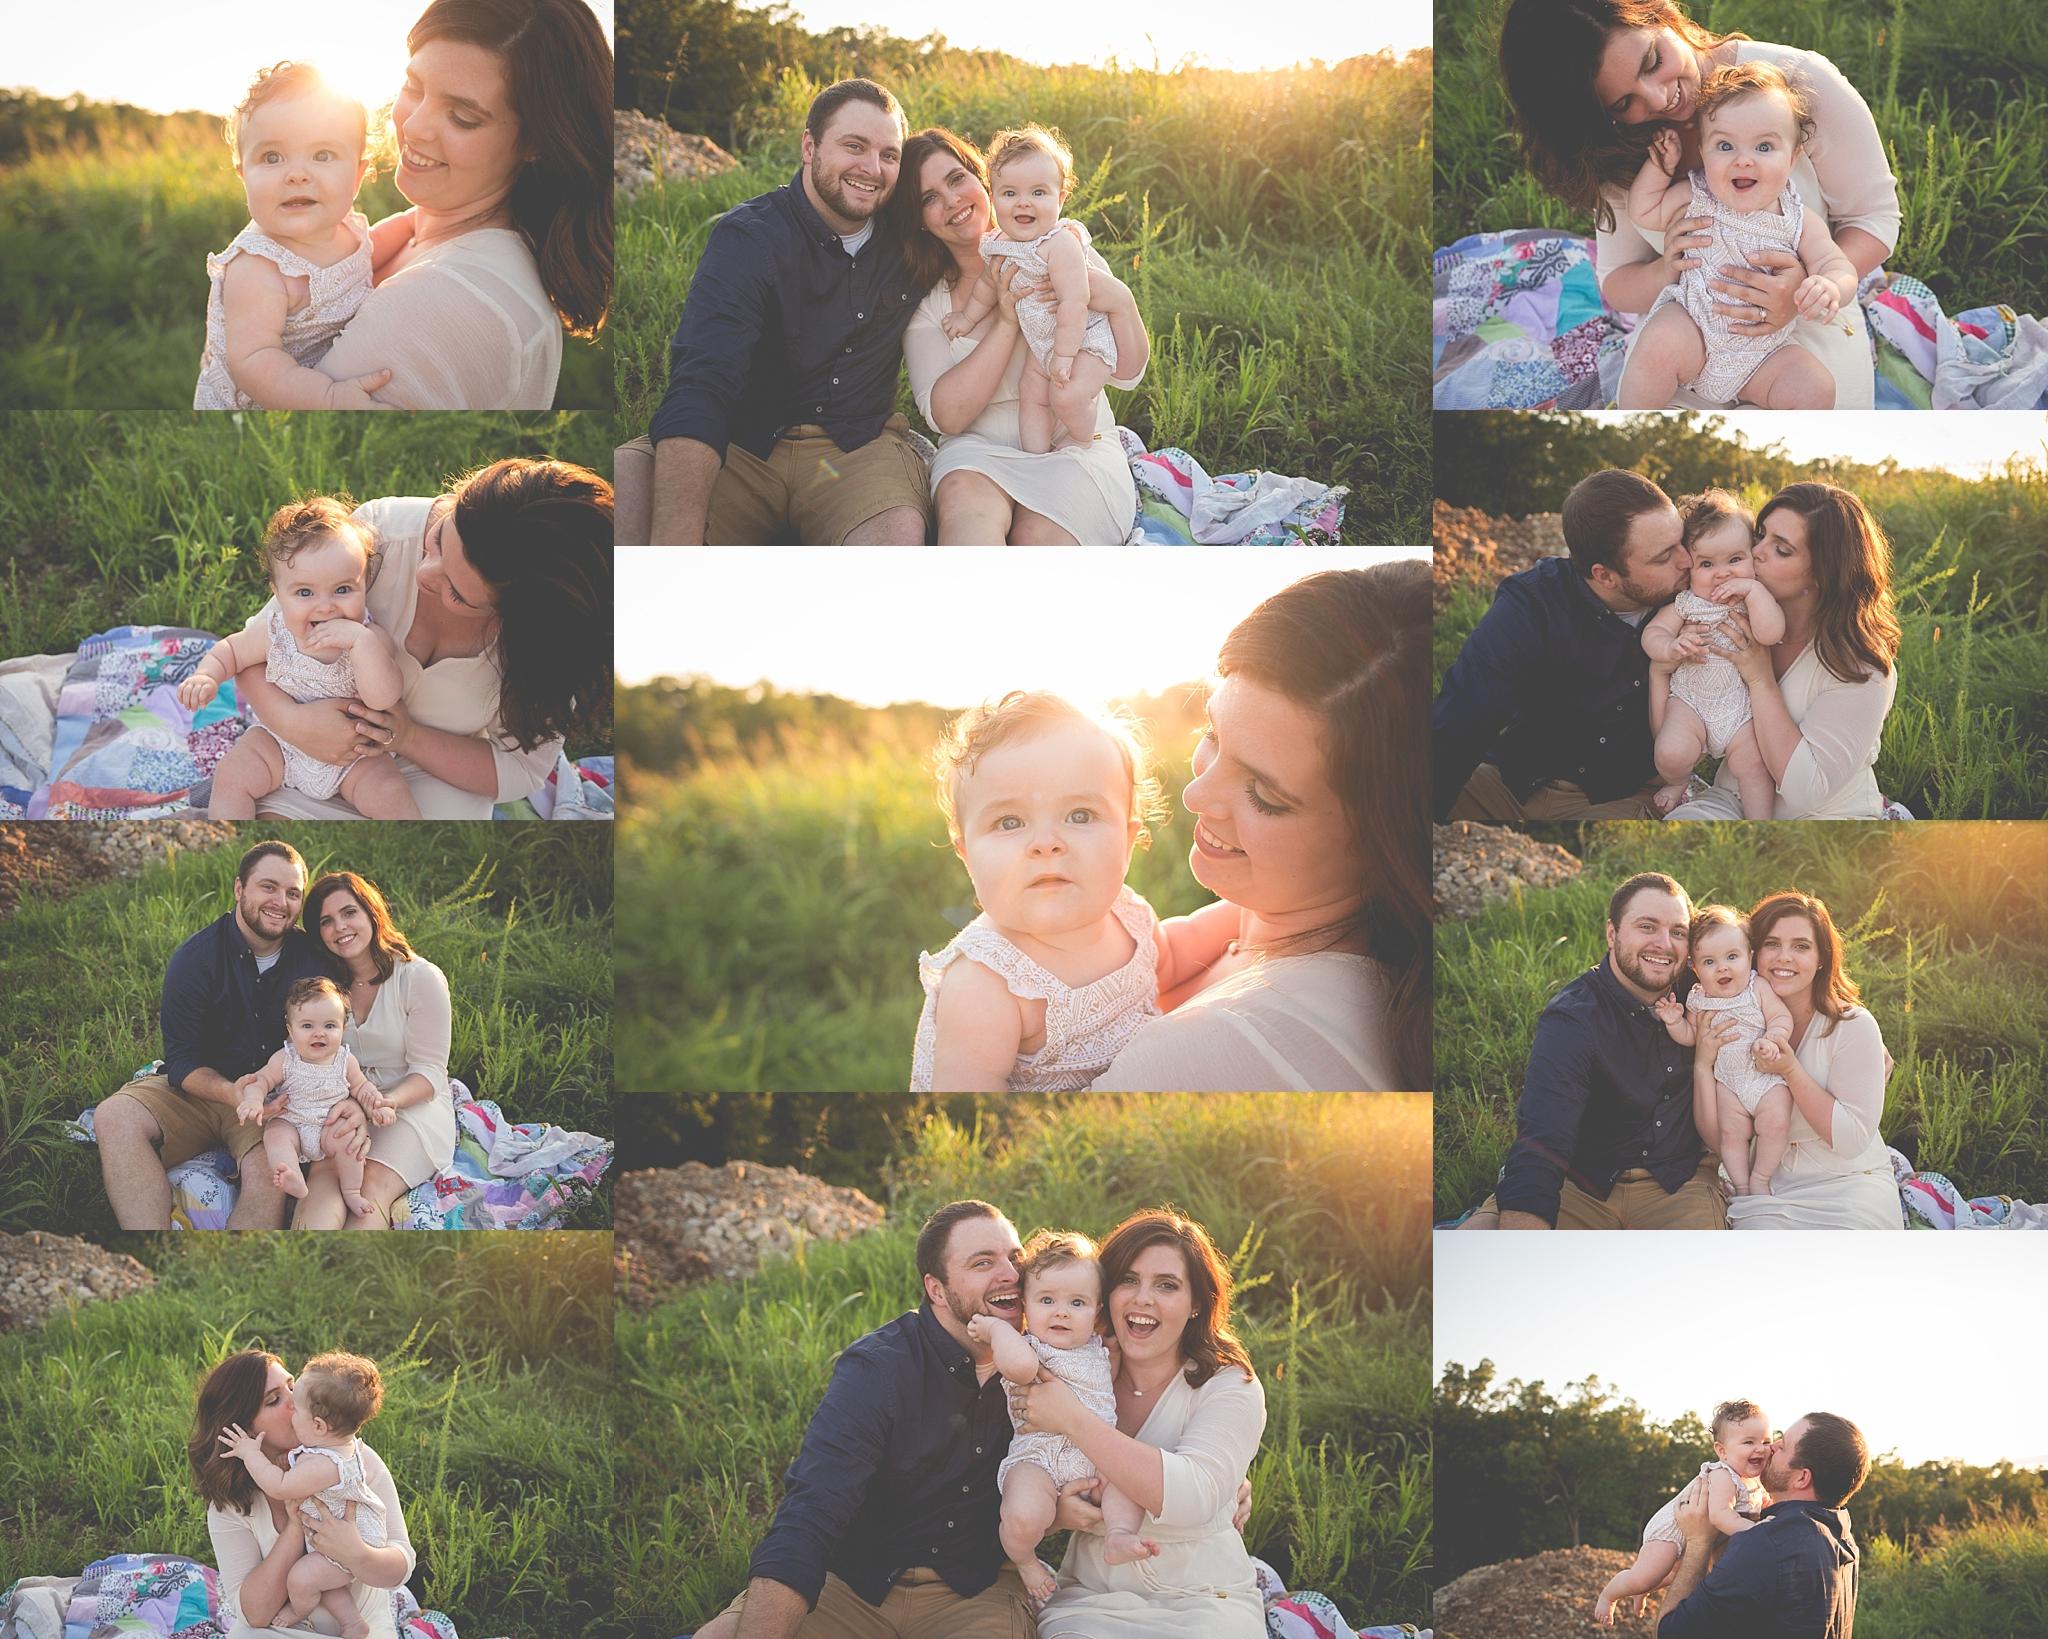 08-23-17-lake ozarks missouri family baby outdoor photography mini session2.jpg